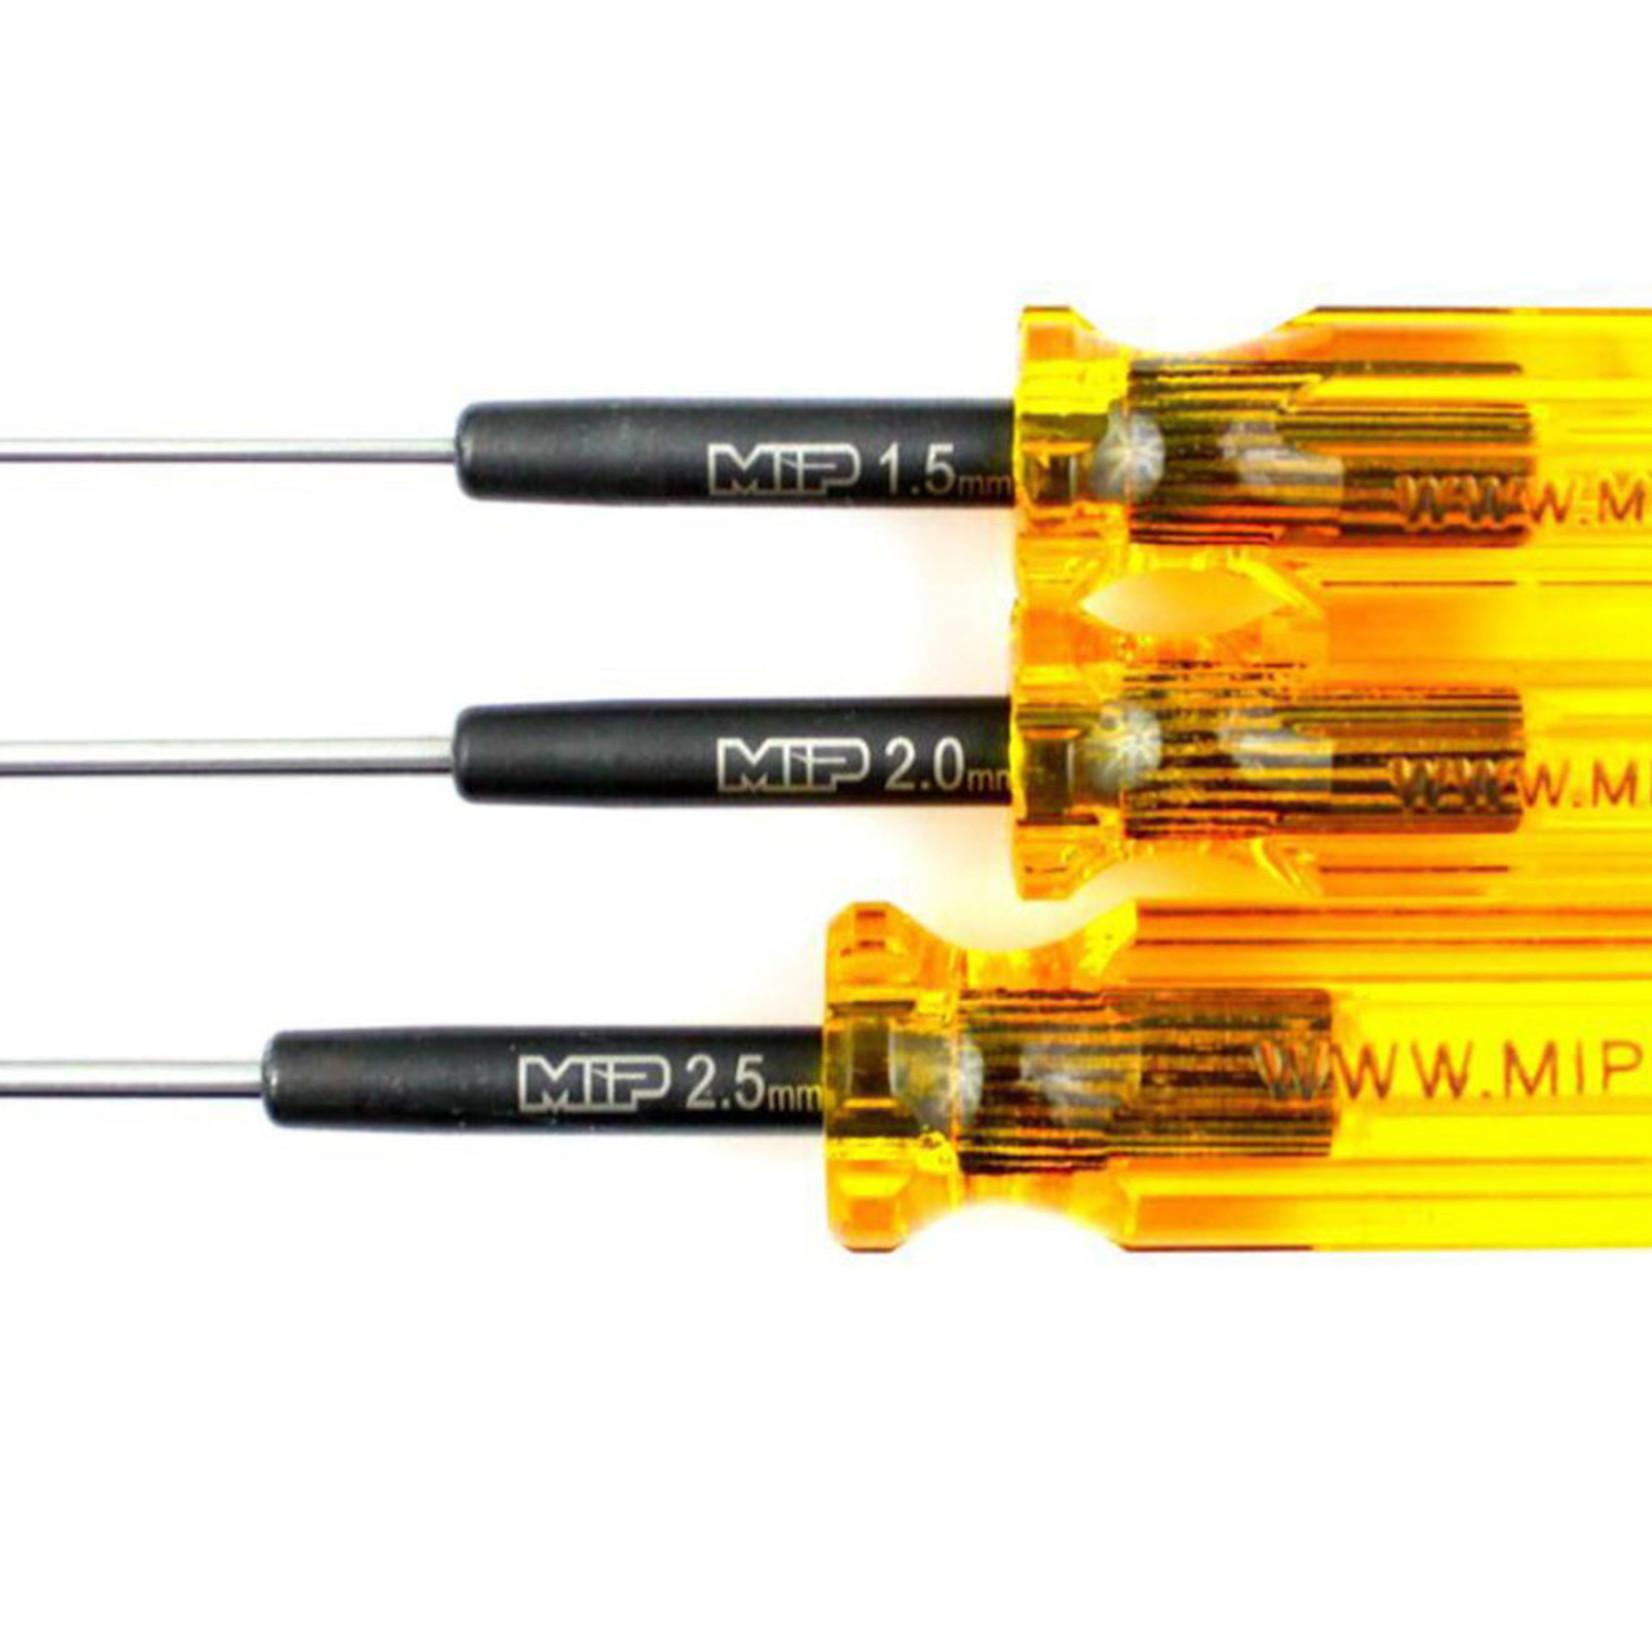 MIP MIP9502 MIP Metric Hex Set